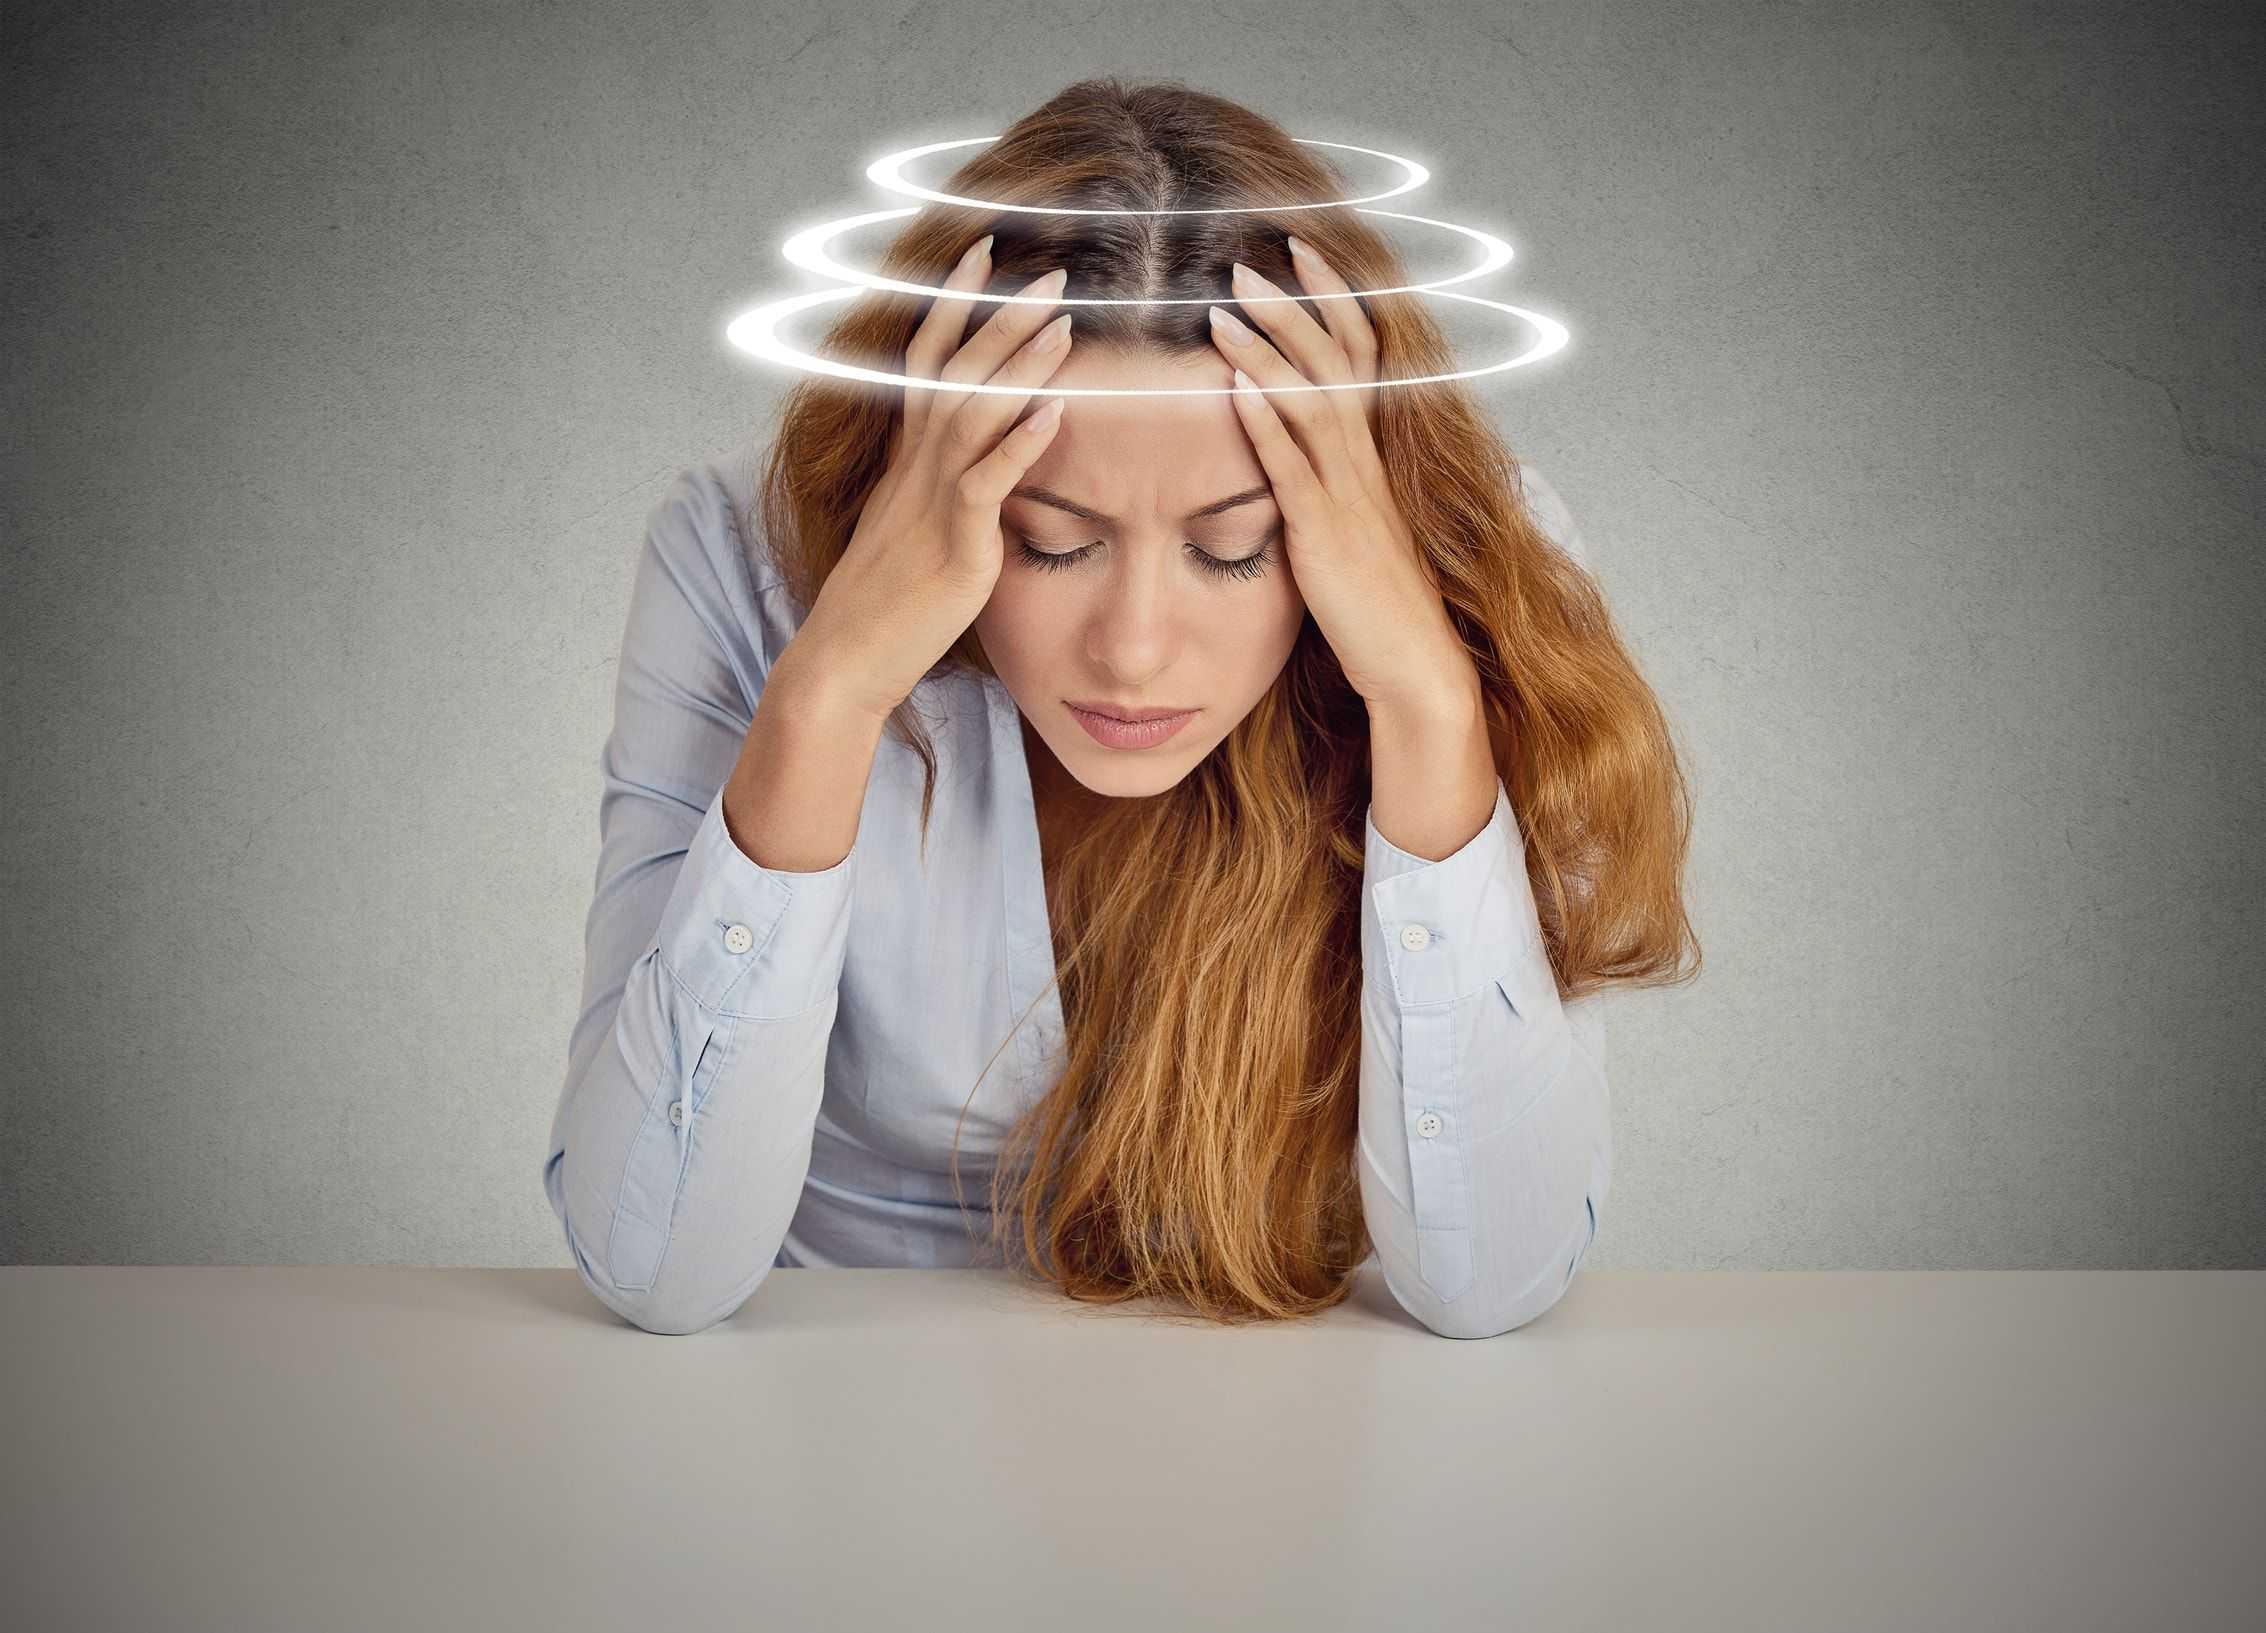 Синдром Сомоджи